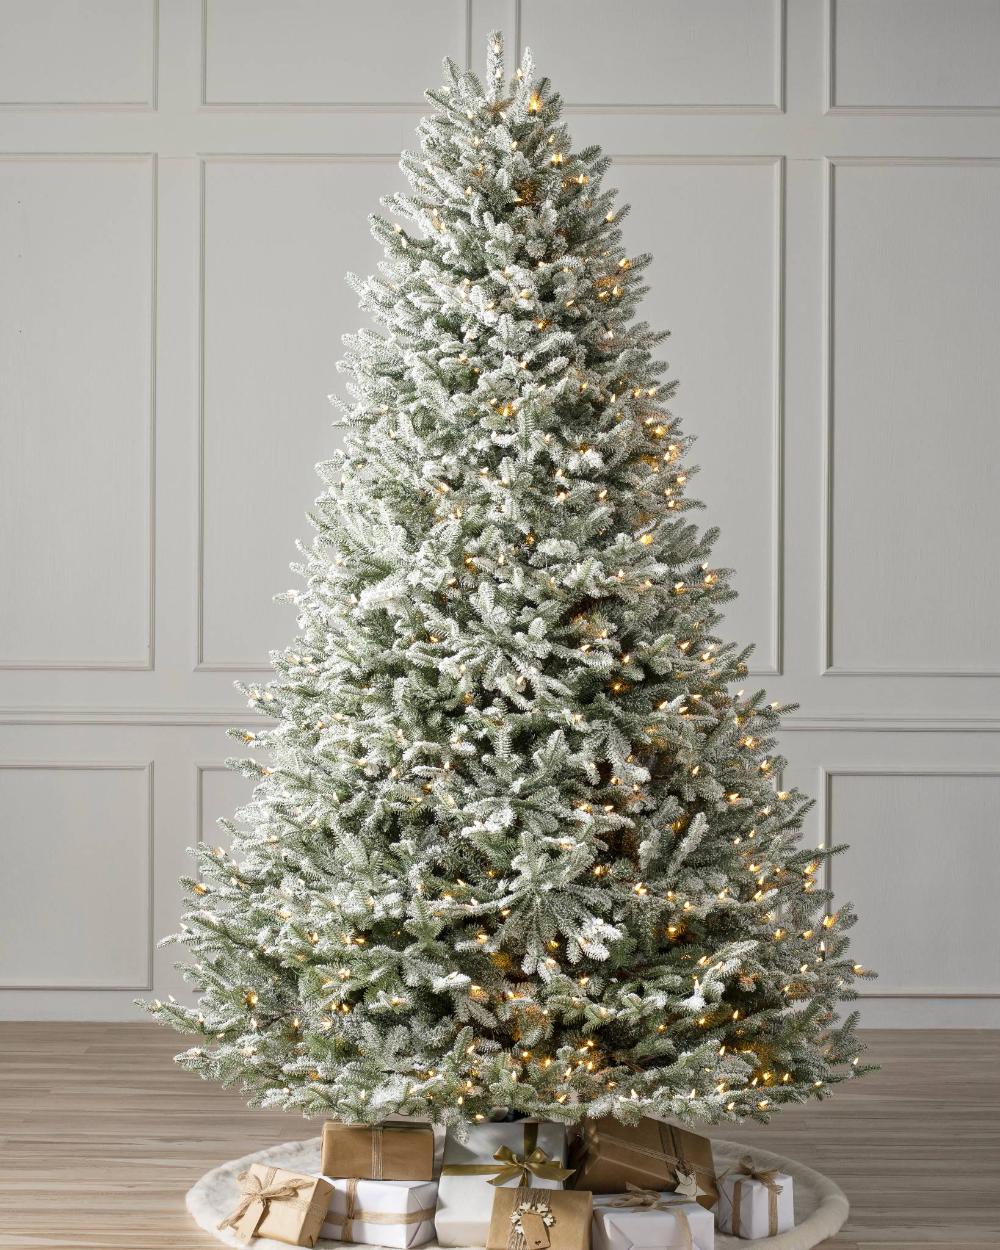 Bh Balsam Fir: Realistic Artificial Christmas